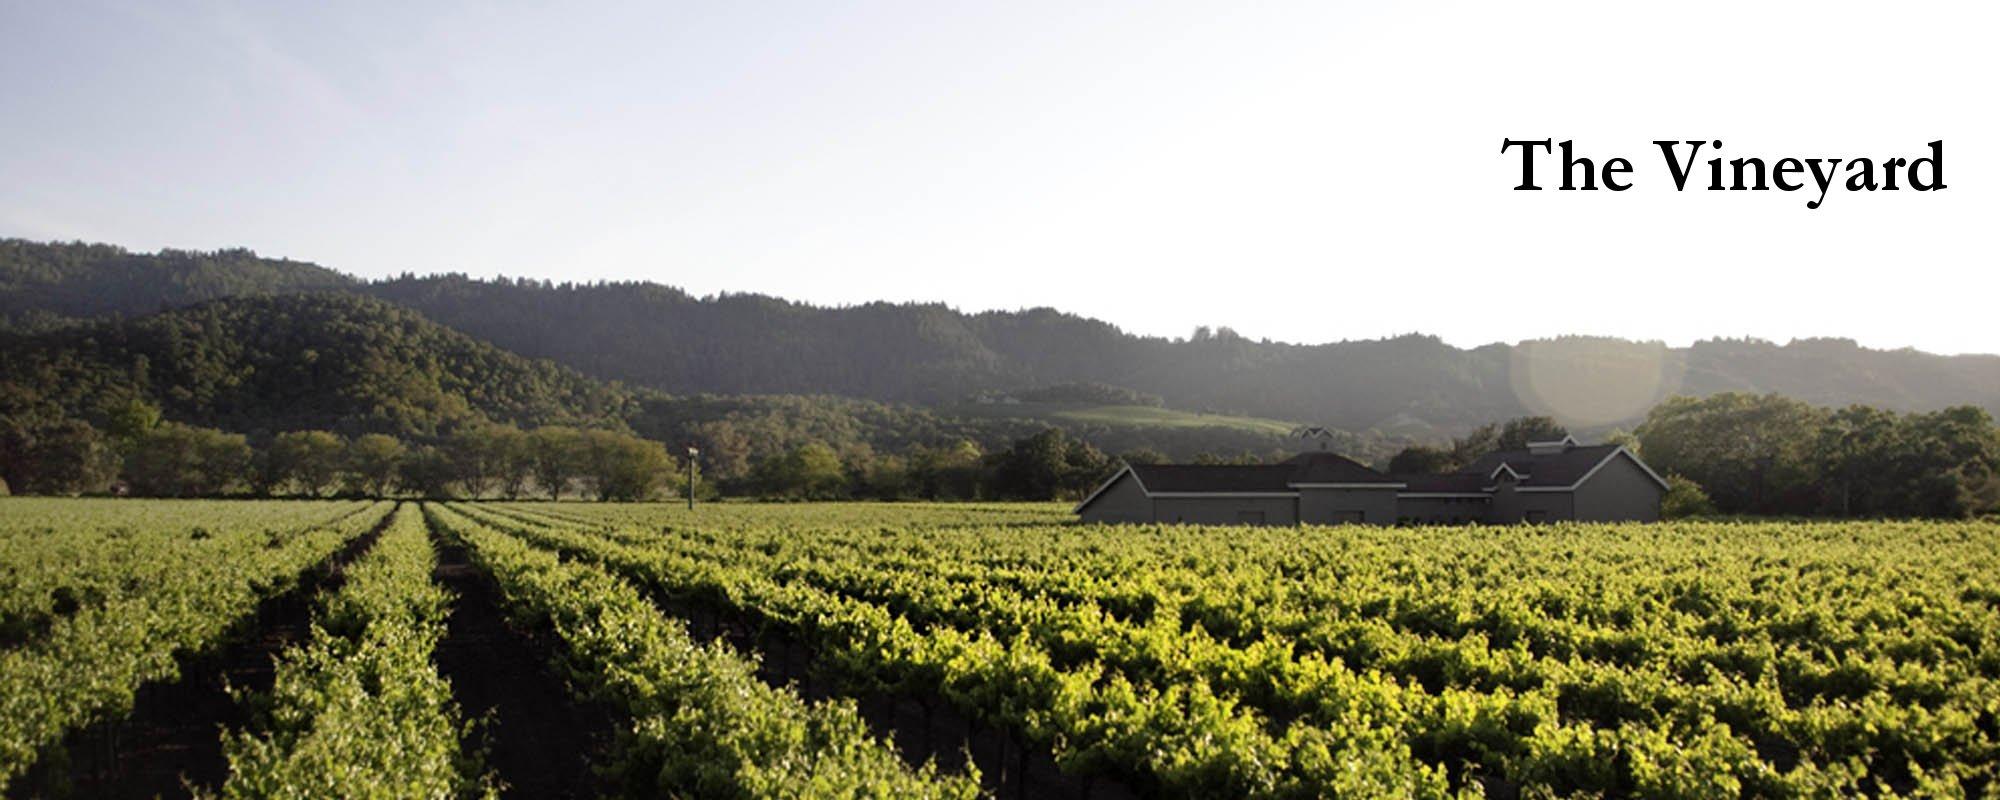 vineyards4x